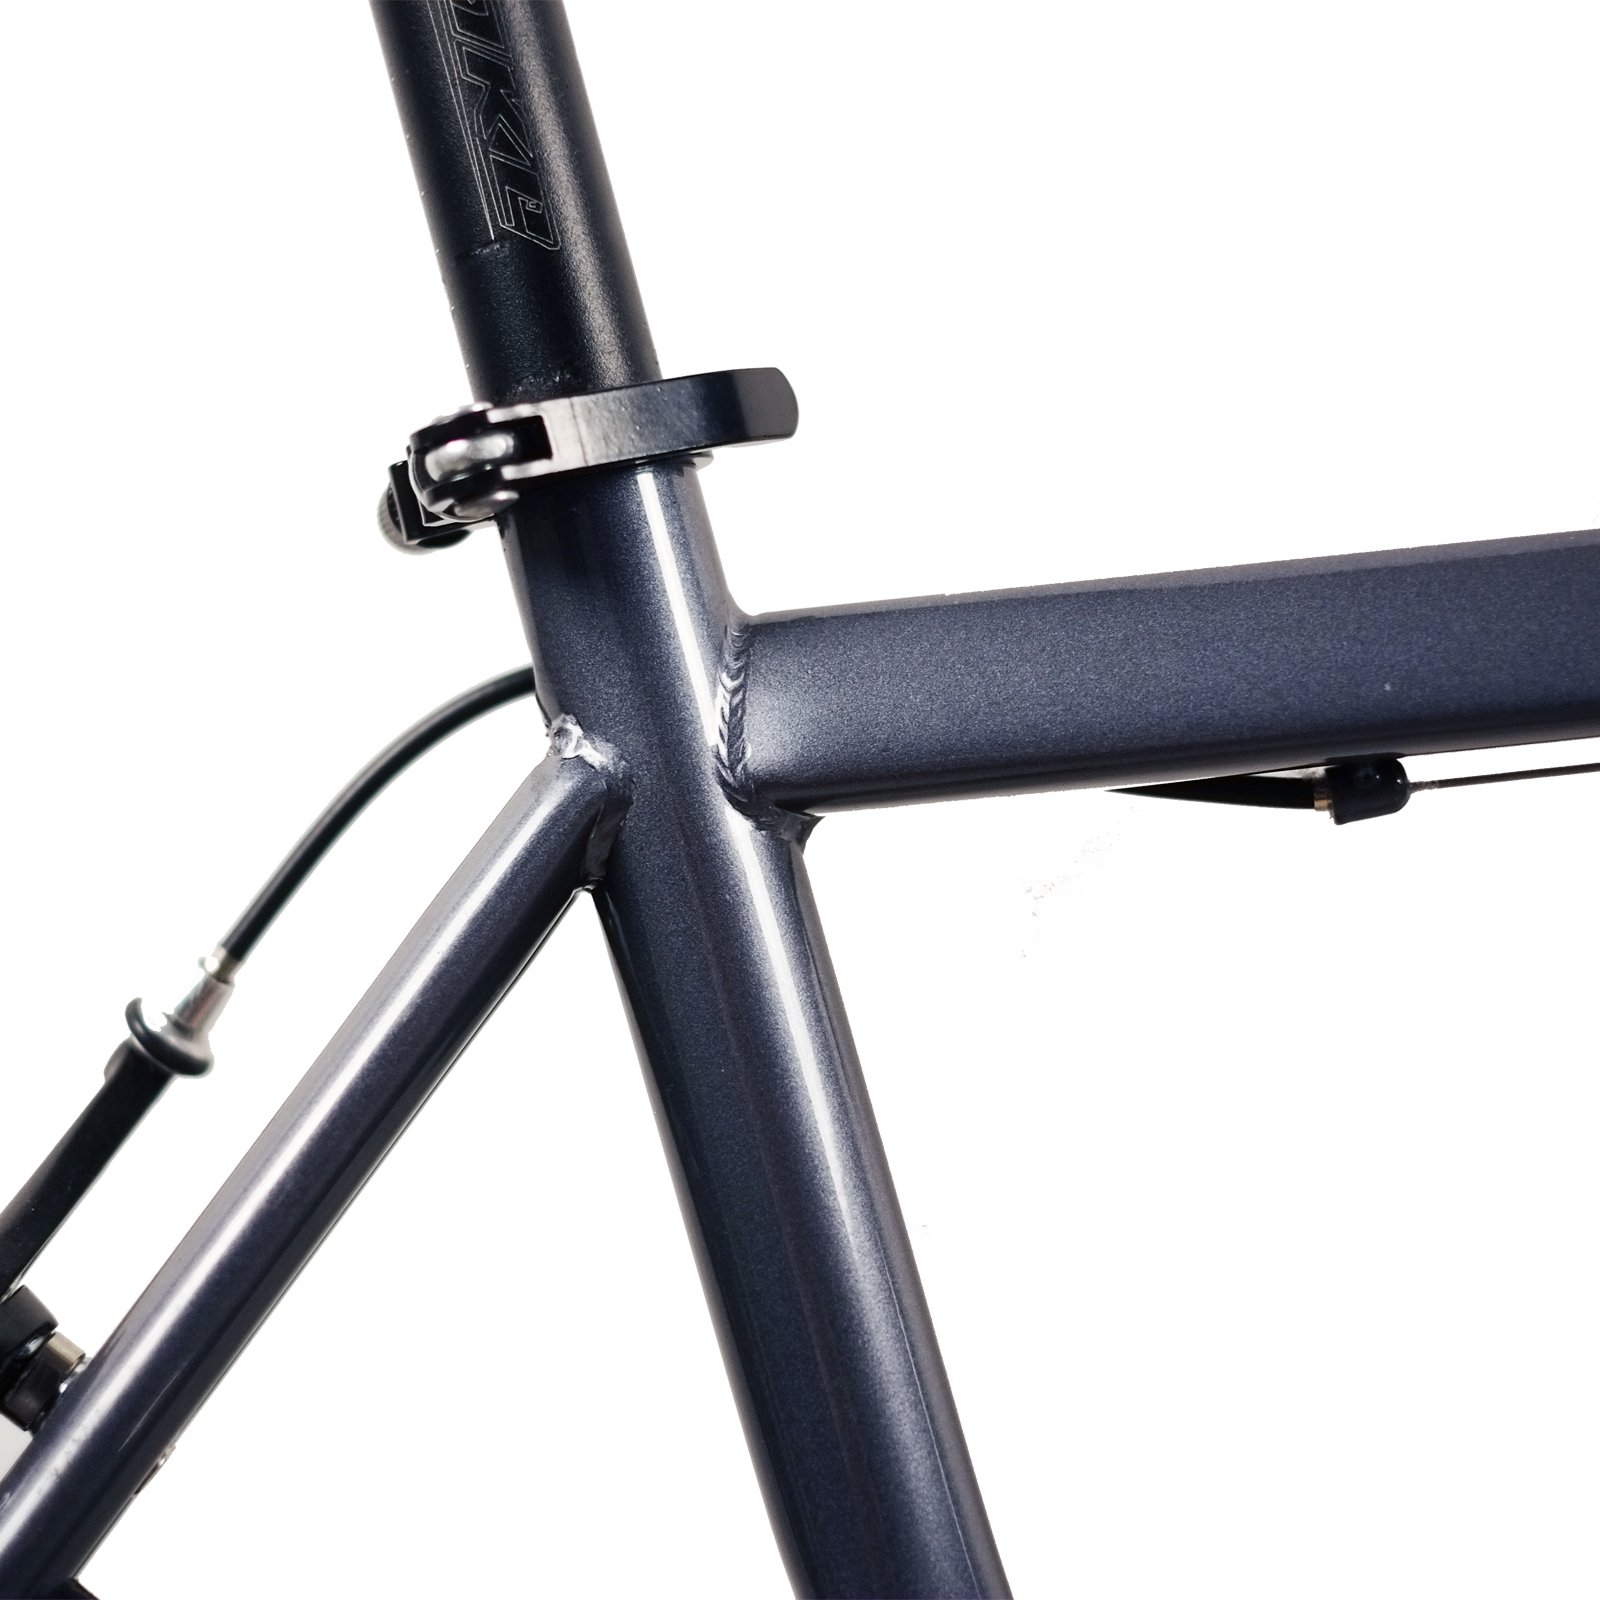 Solomone Cavalli Lightweight Classic Sports 8 Speed 700C Medium Road Bicycle Bike w/Shimano Derailleur by Solomone Cavalli (Image #7)